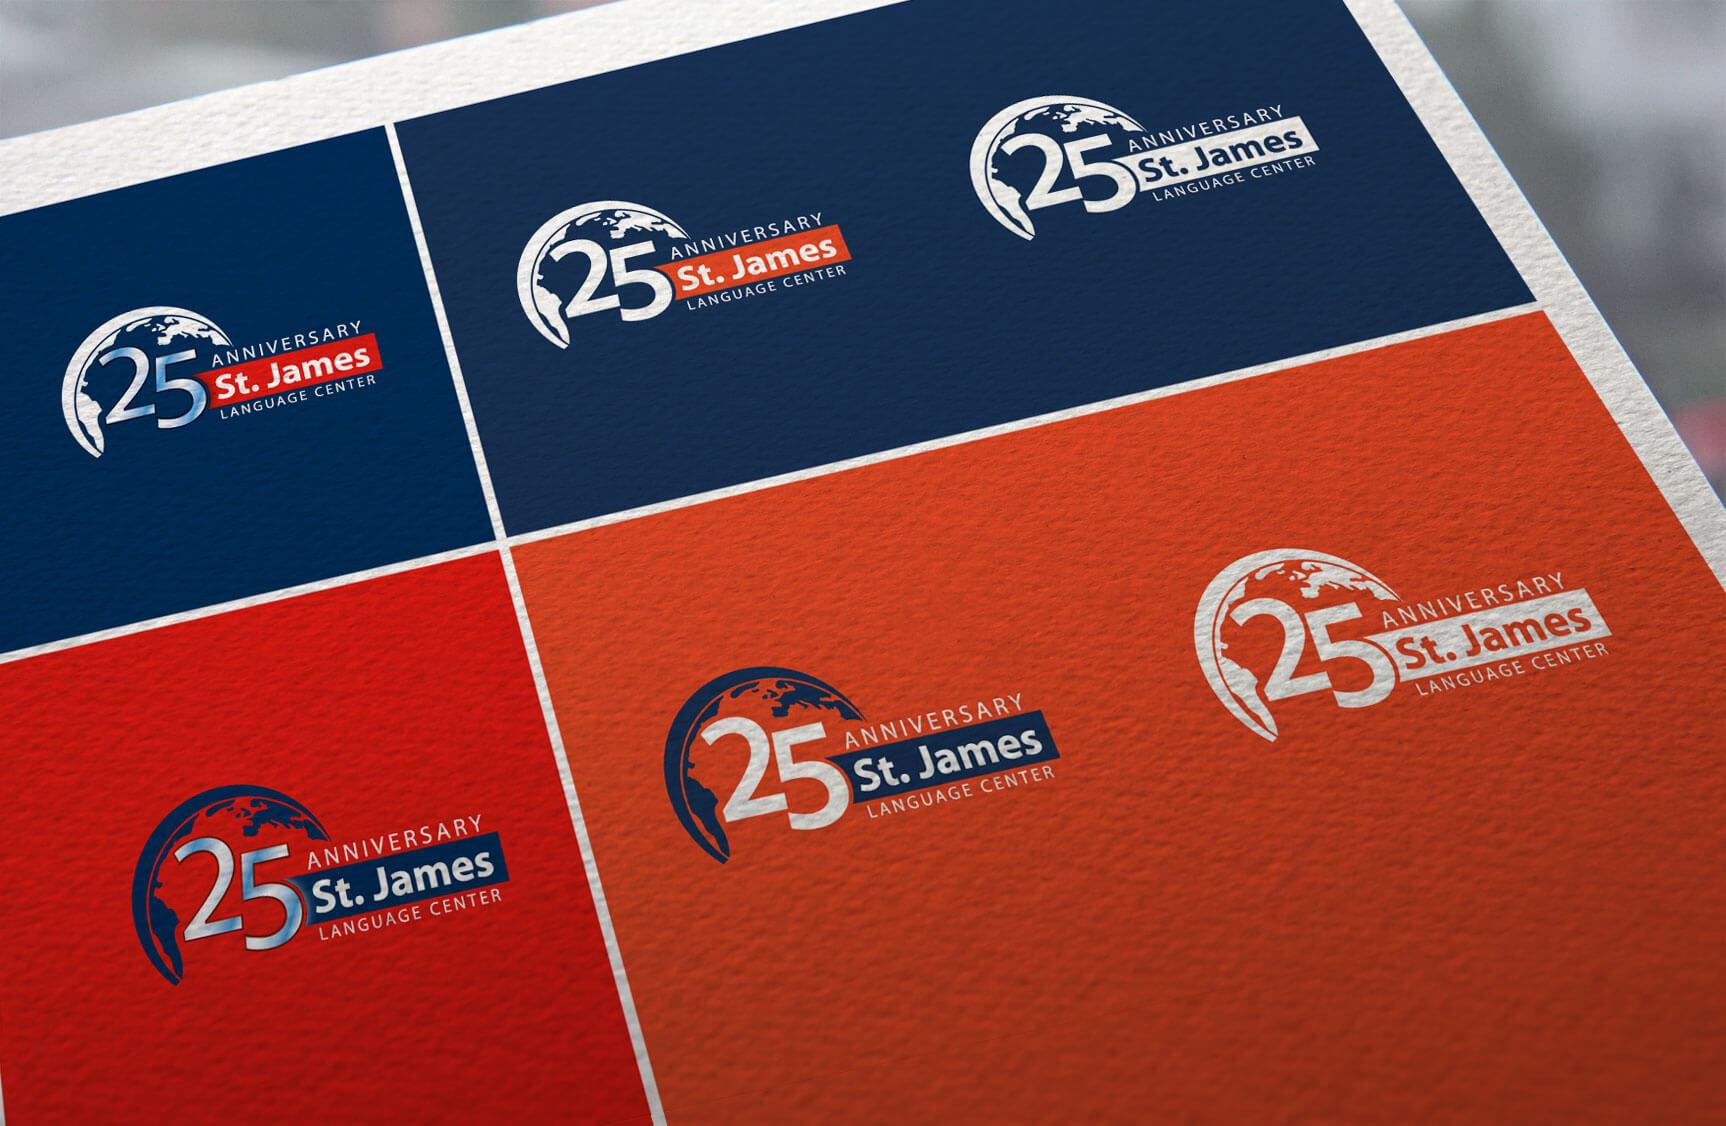 St James 25 anniversary - Logotipos negativos